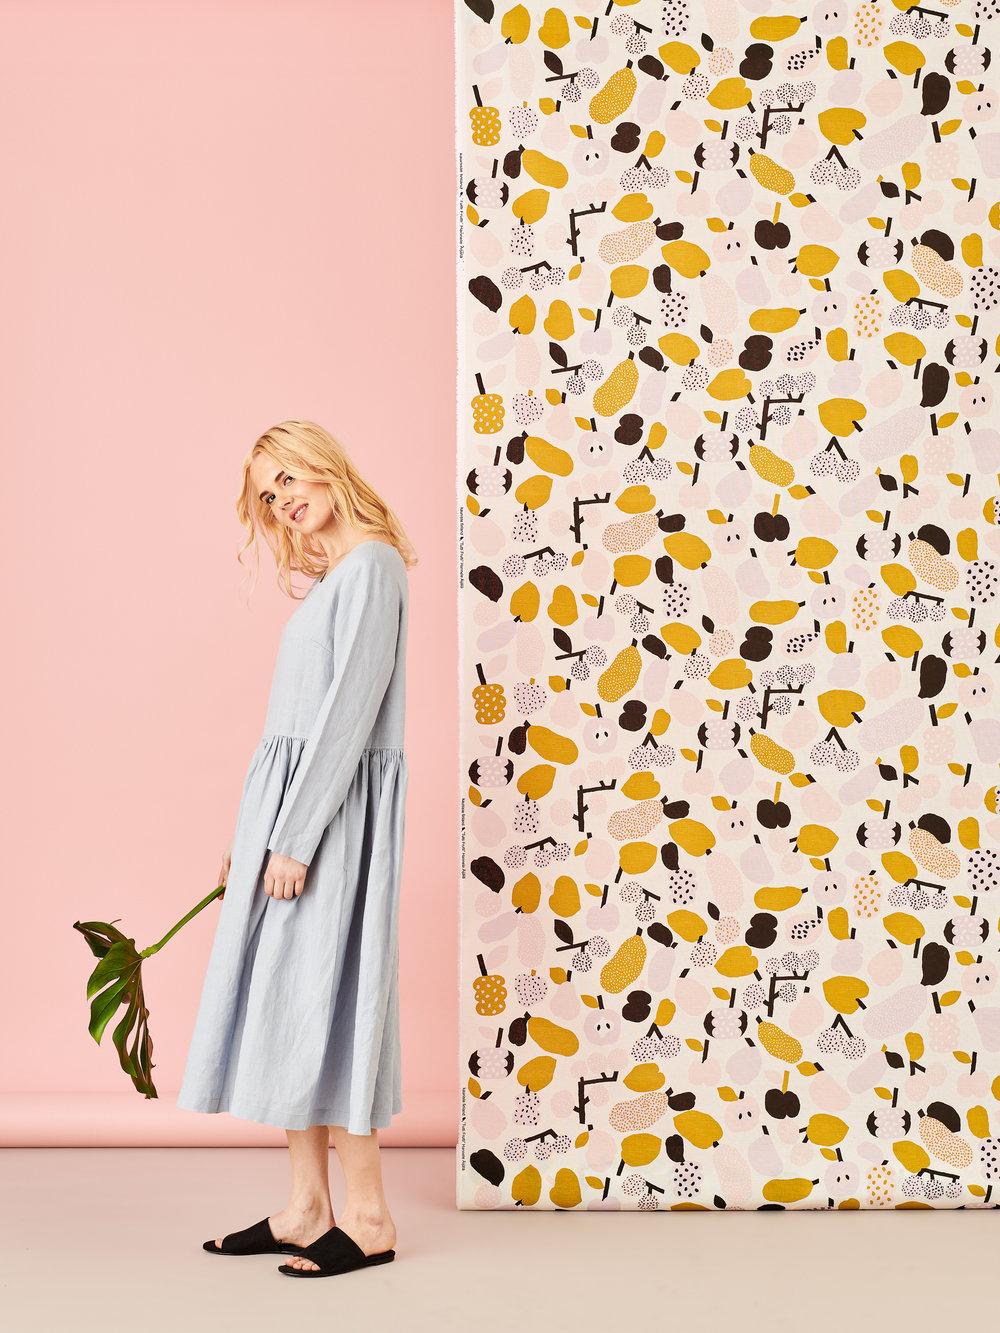 Tutti Frutti fabric by Kauniste Finland